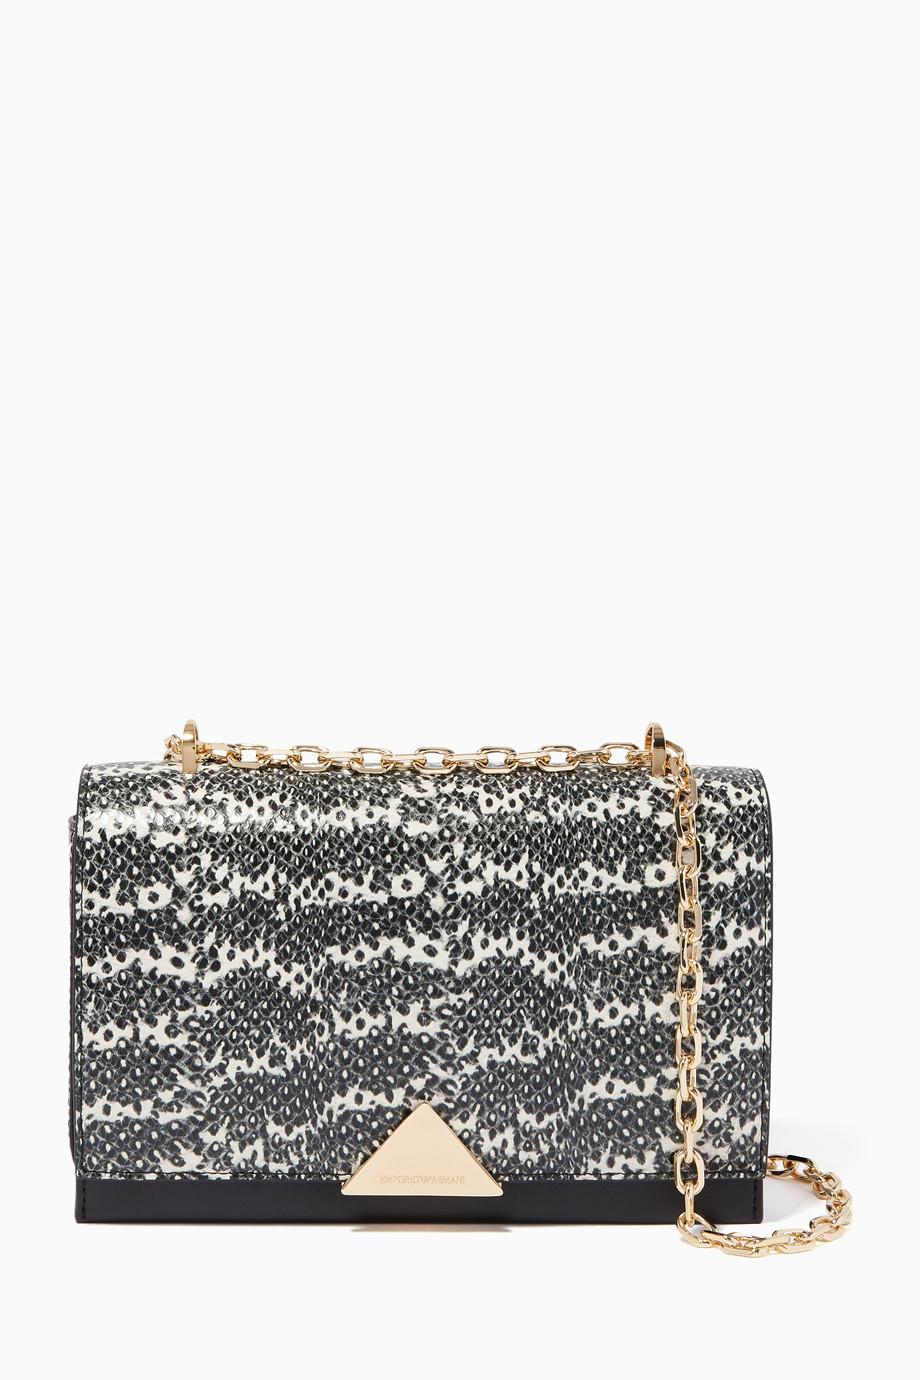 8283251831 Shop Emporio Armani Black Lizard-Print Shoulder Bag for Women ...